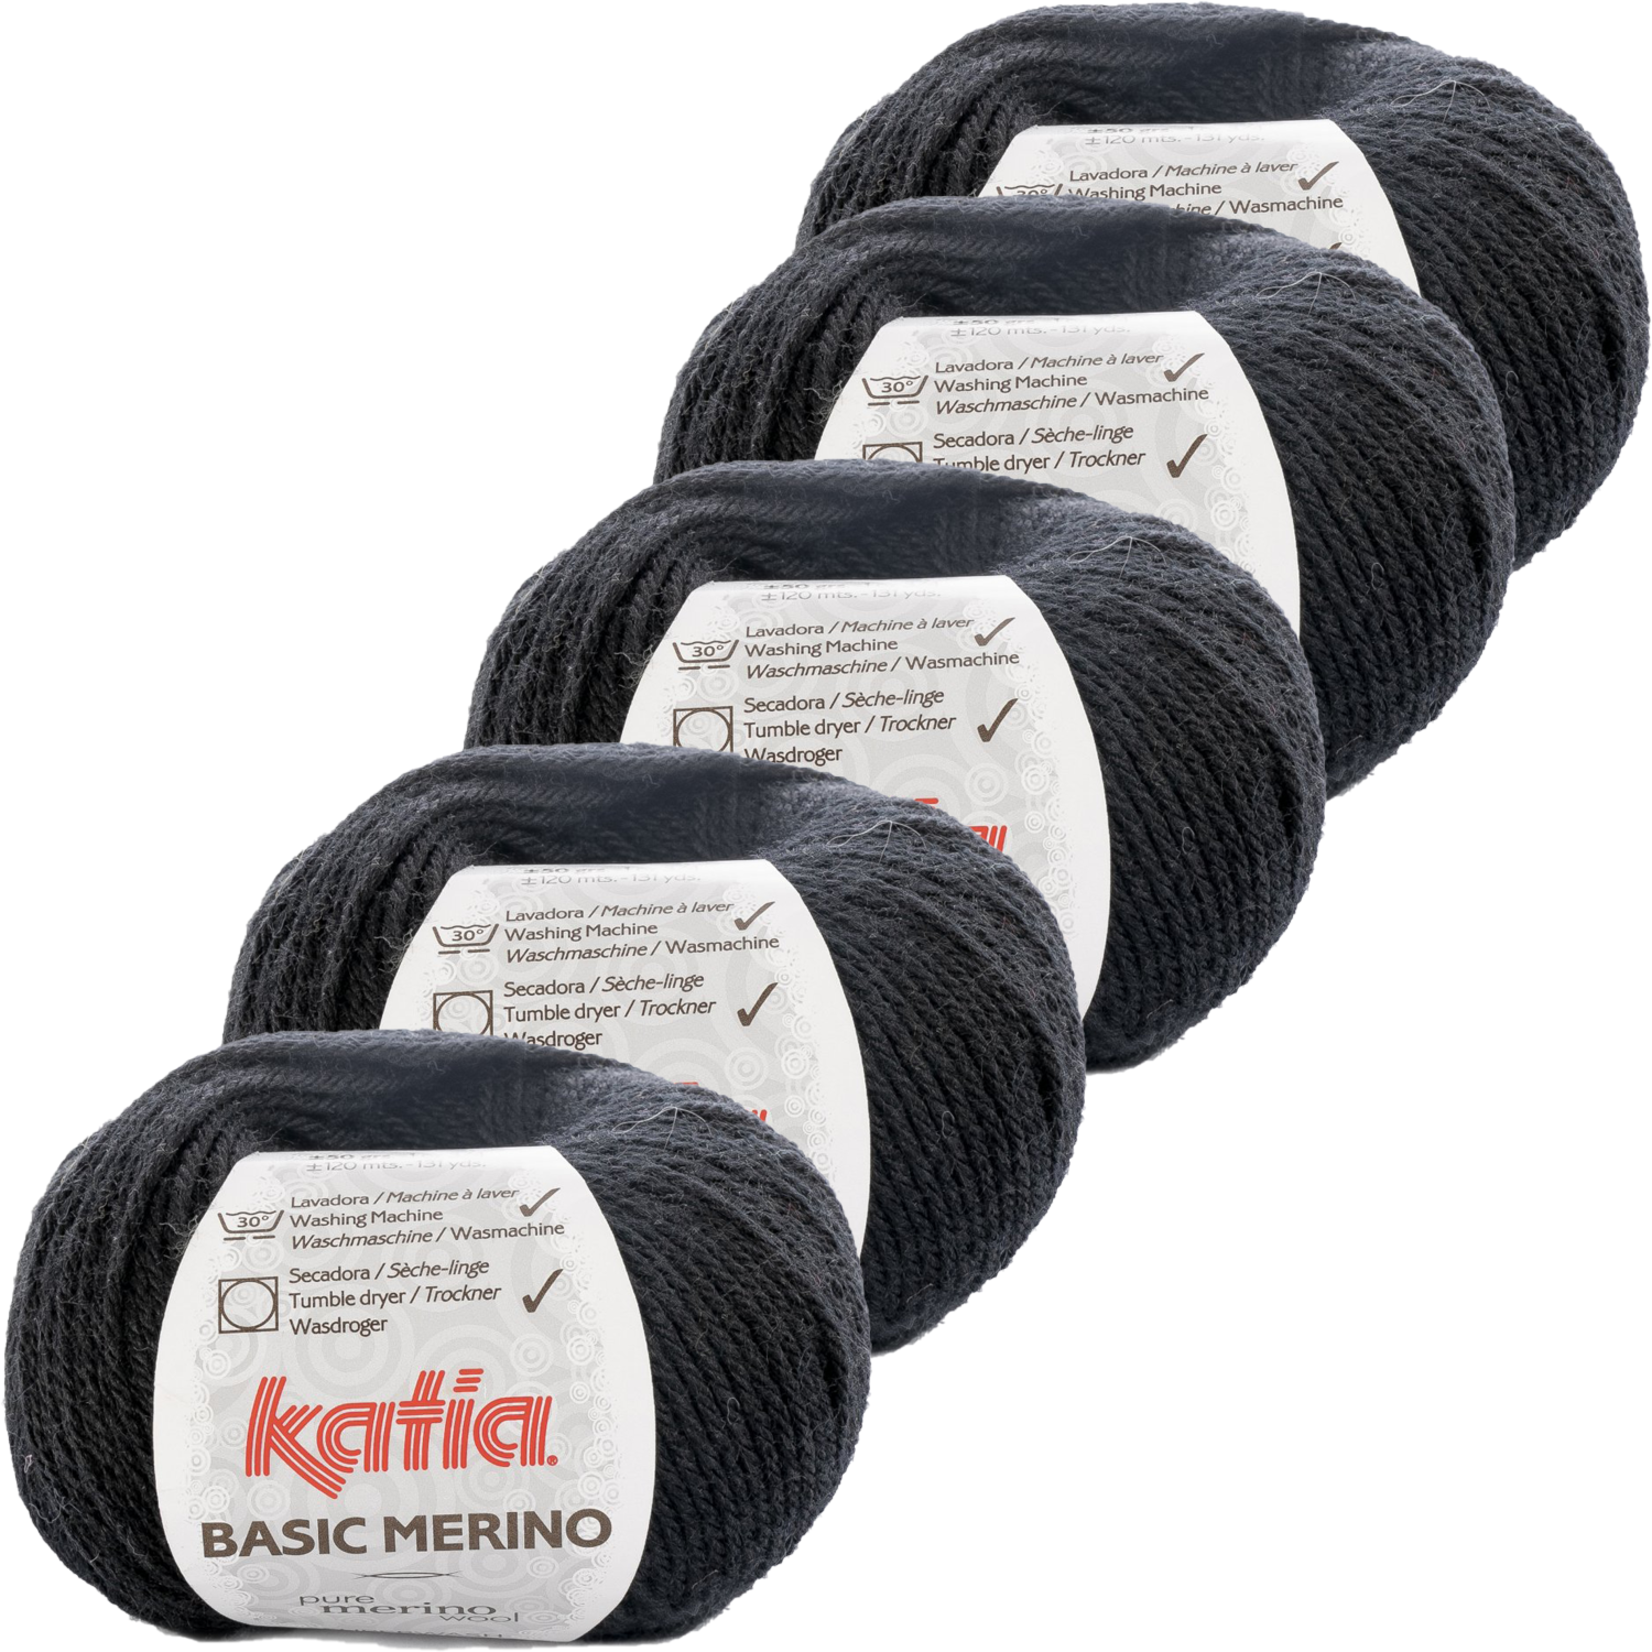 Katia Basic Merino - kleur 2_Zwart - bundel 5 bollen 50 gr.  van 120 m.